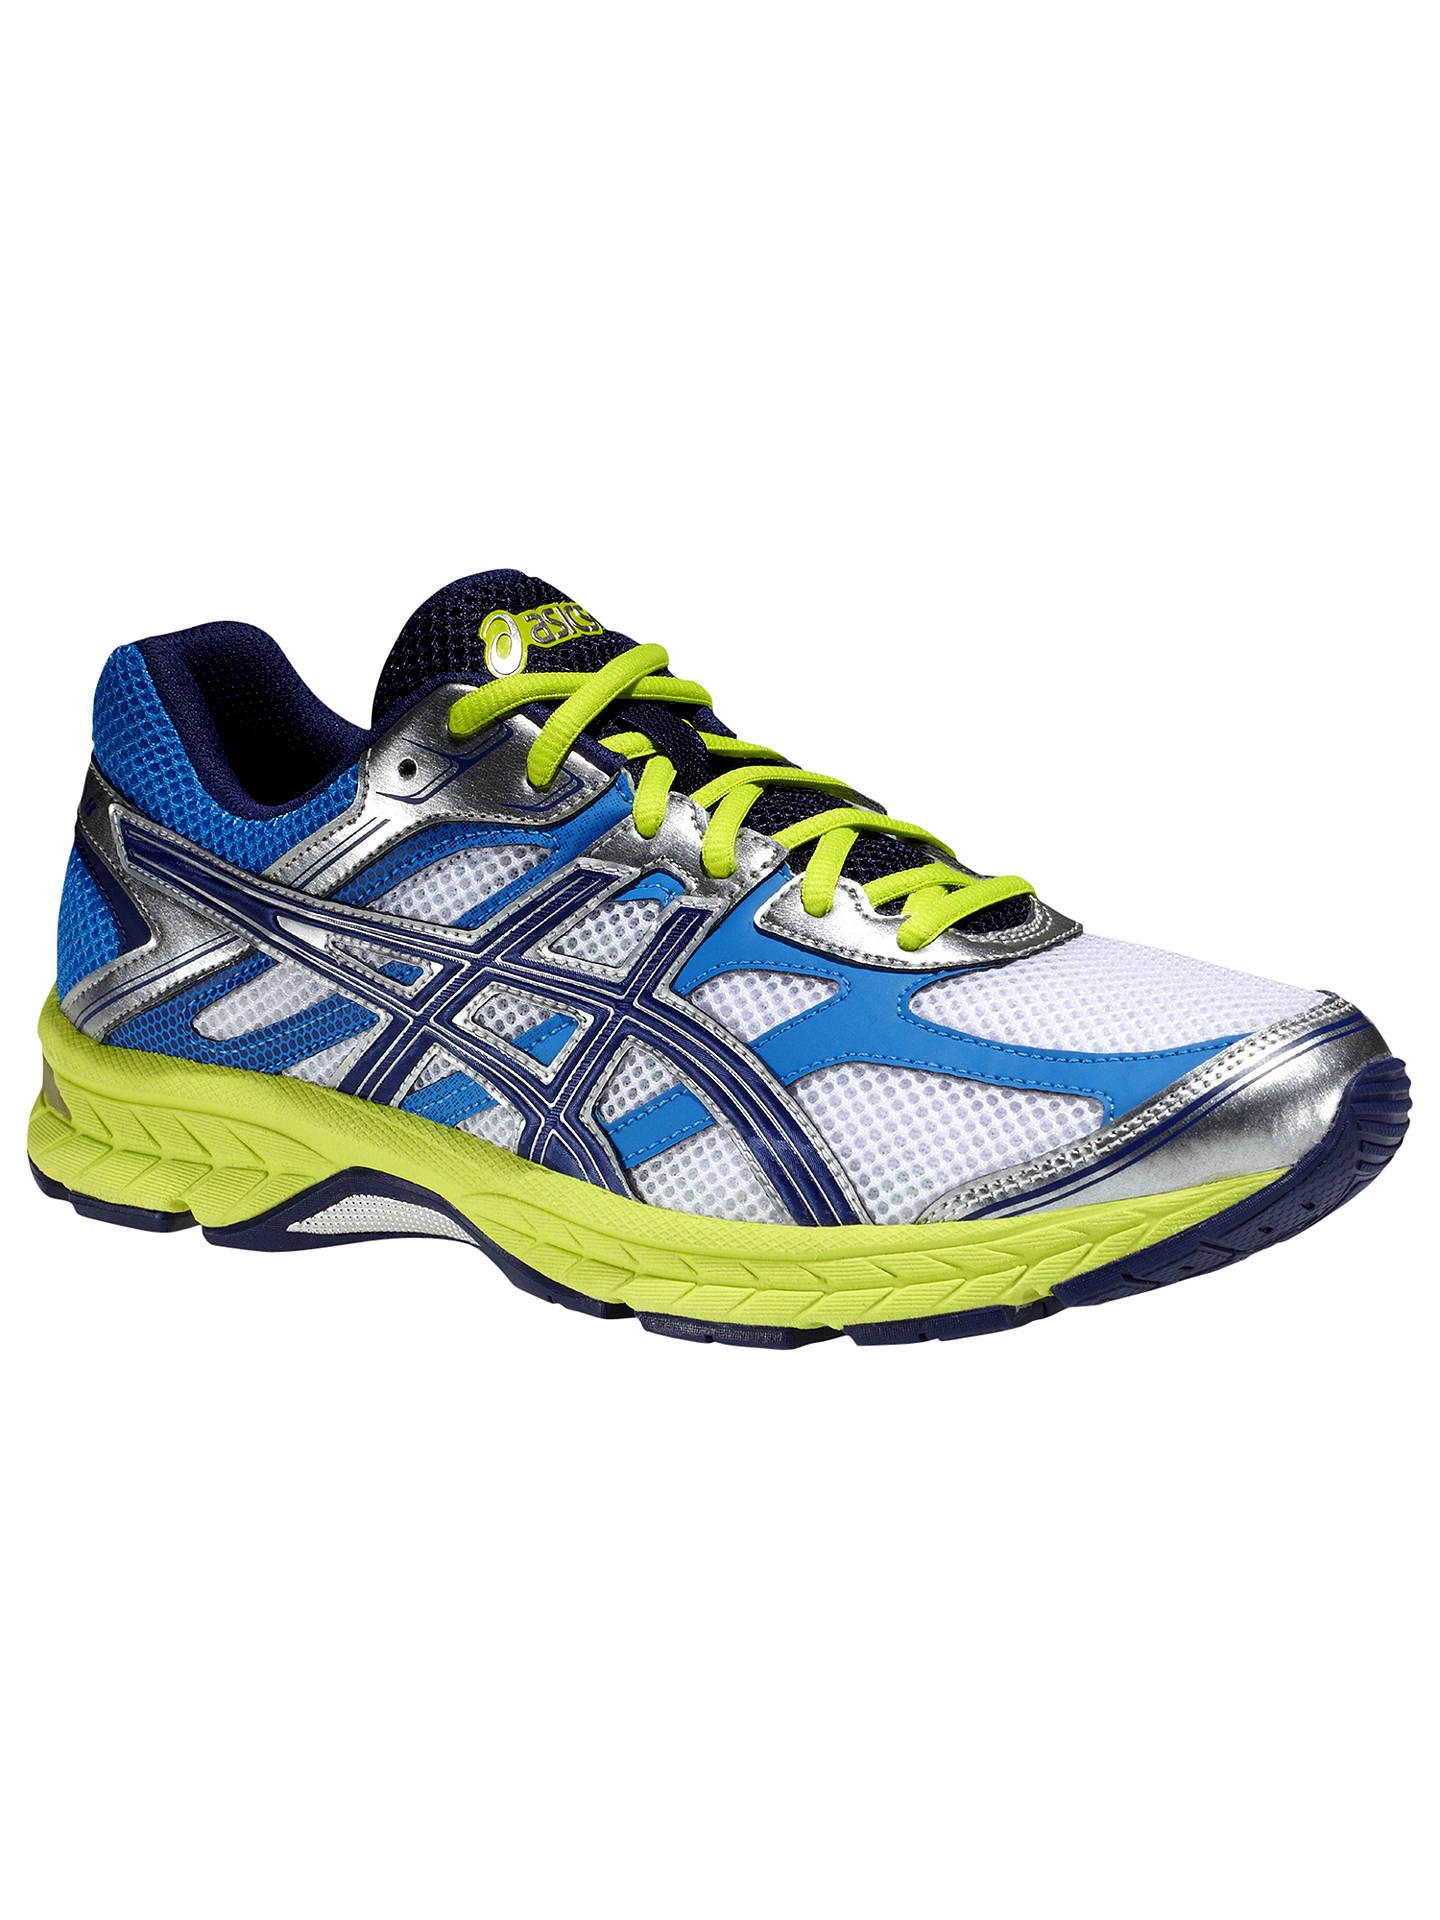 Asics Gel Oberon 8 Men's Running Shoes at John Lewis & Partners